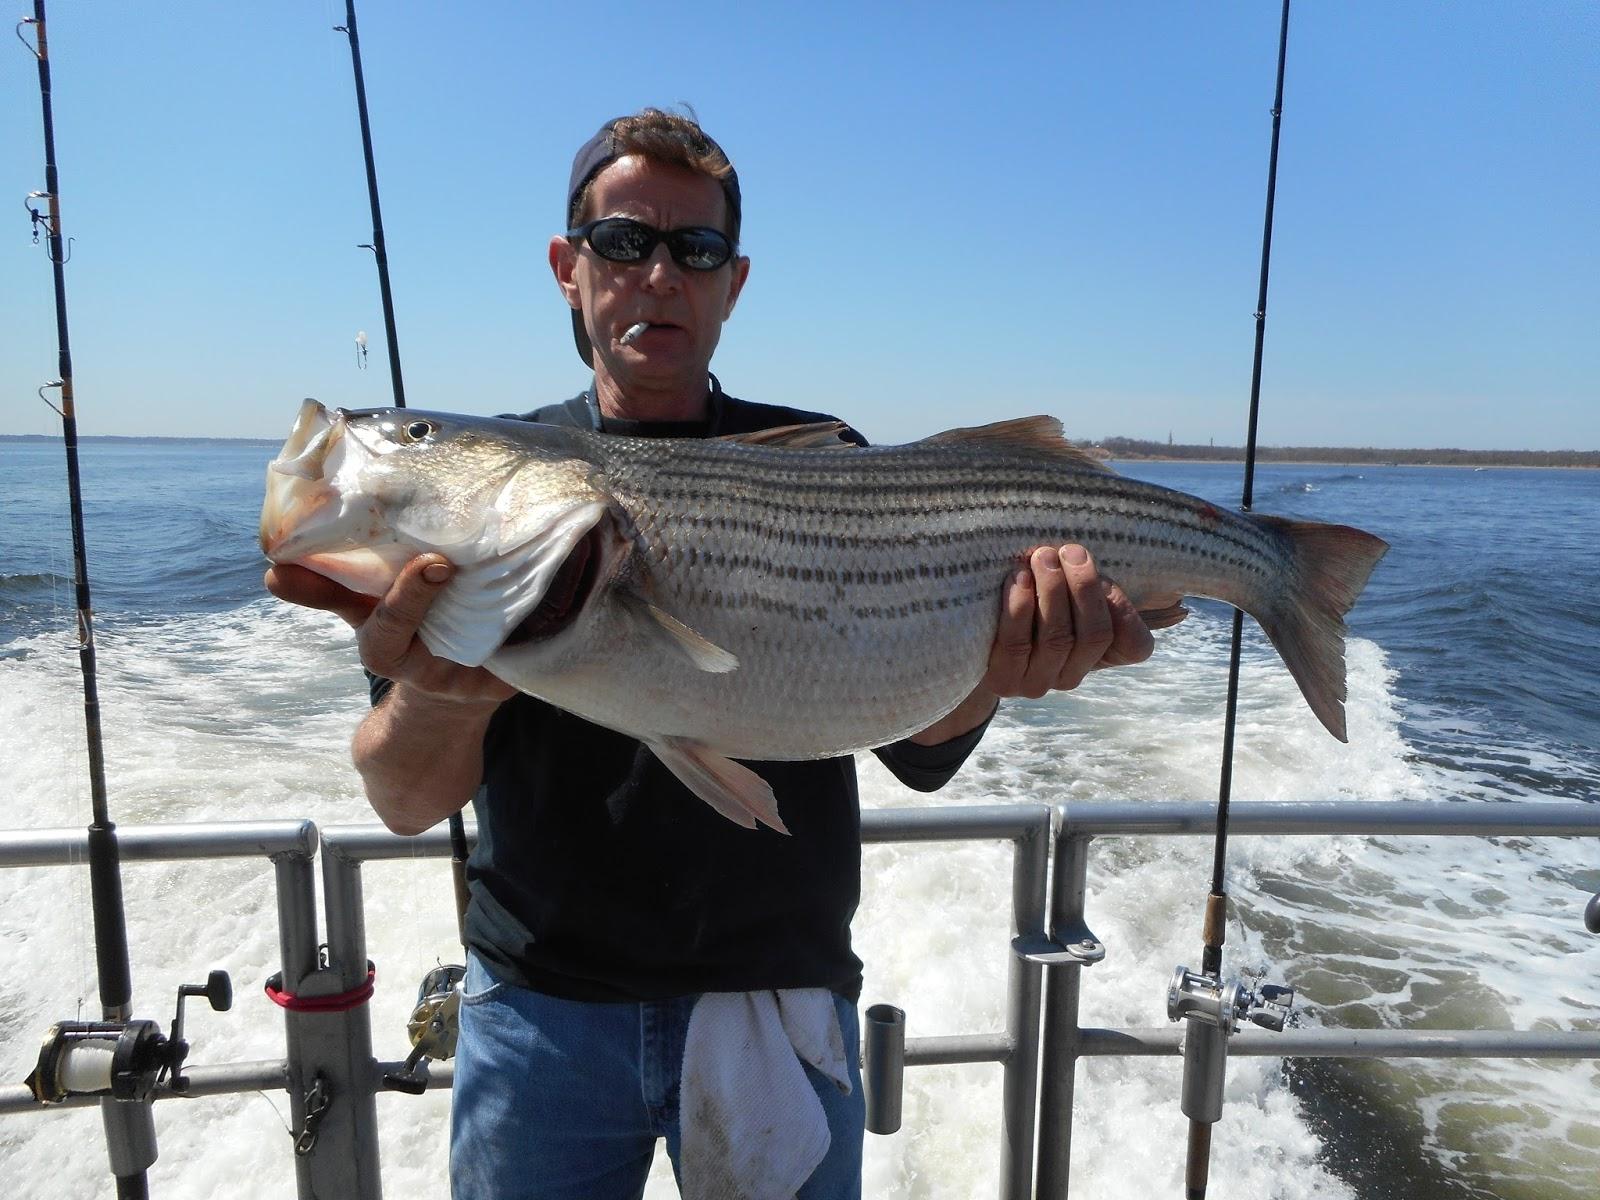 Nj salt fish 2016 04 17 seahunter atlantic highlands for Atlantic highlands fishing report